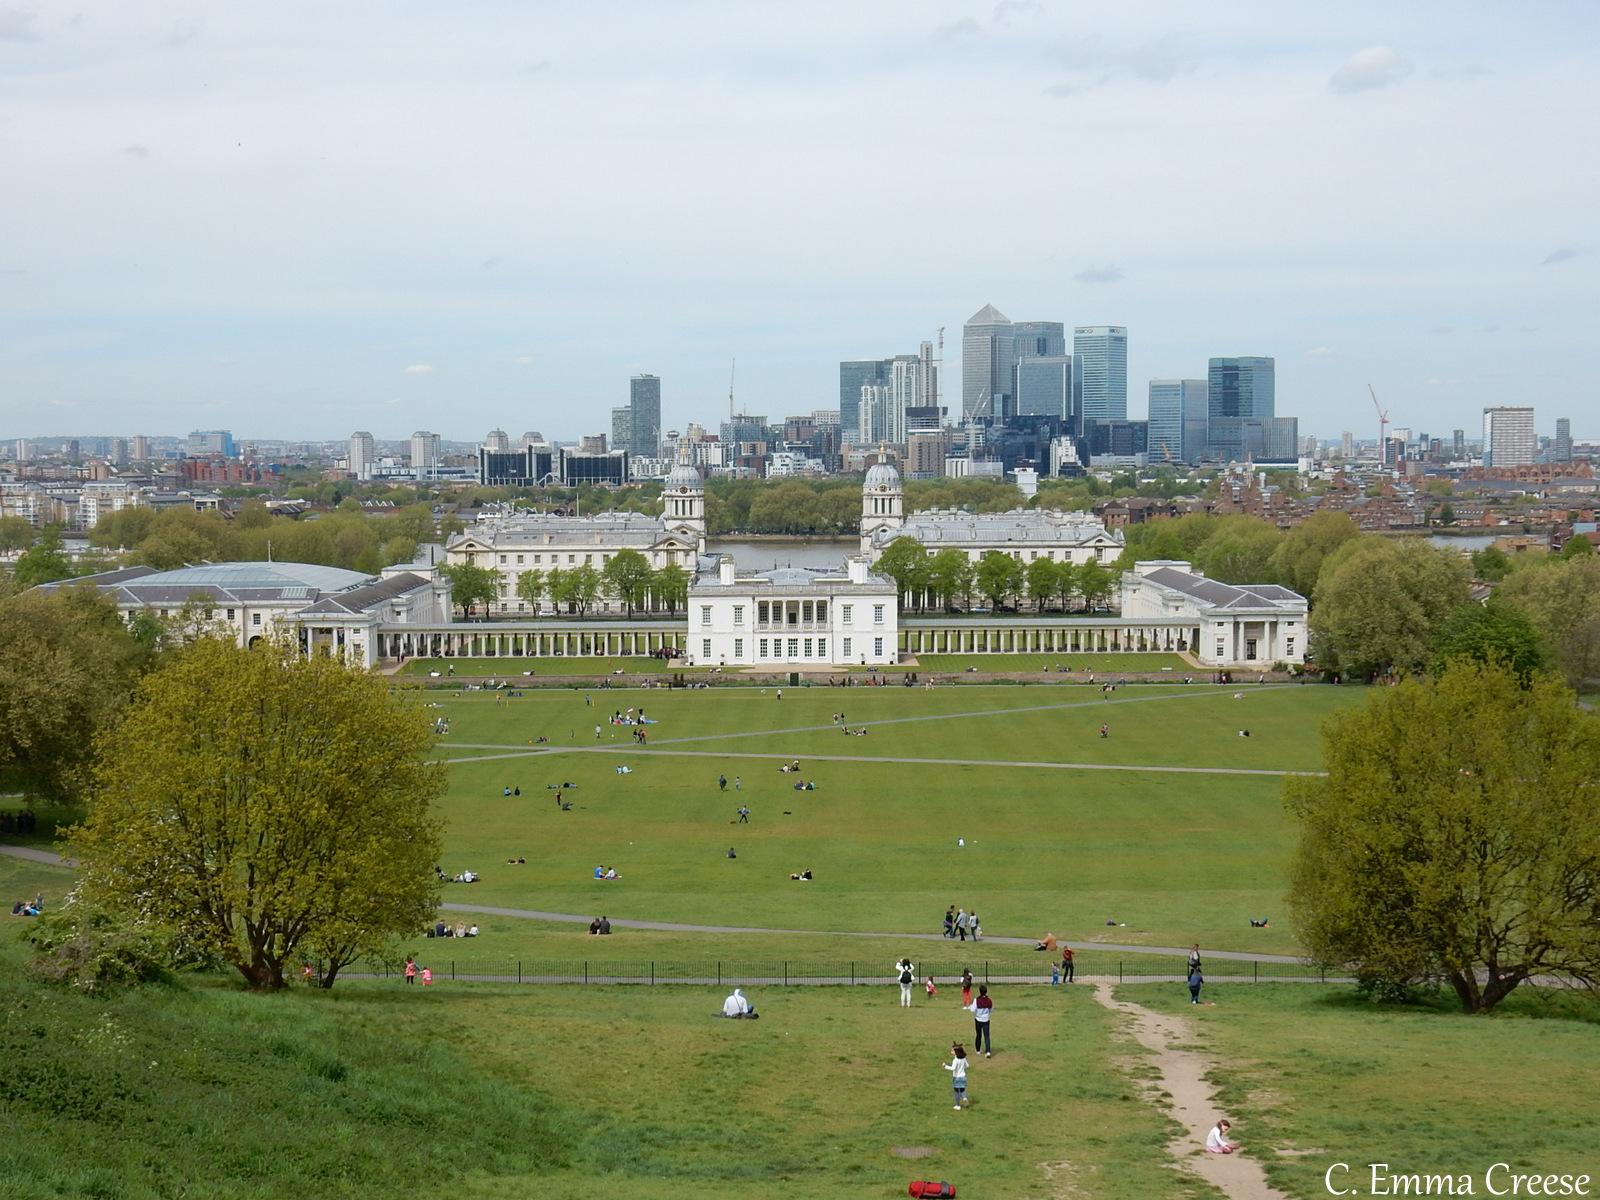 Greenwich The 10 best picnic spots in London Adventures of a London Kiwi